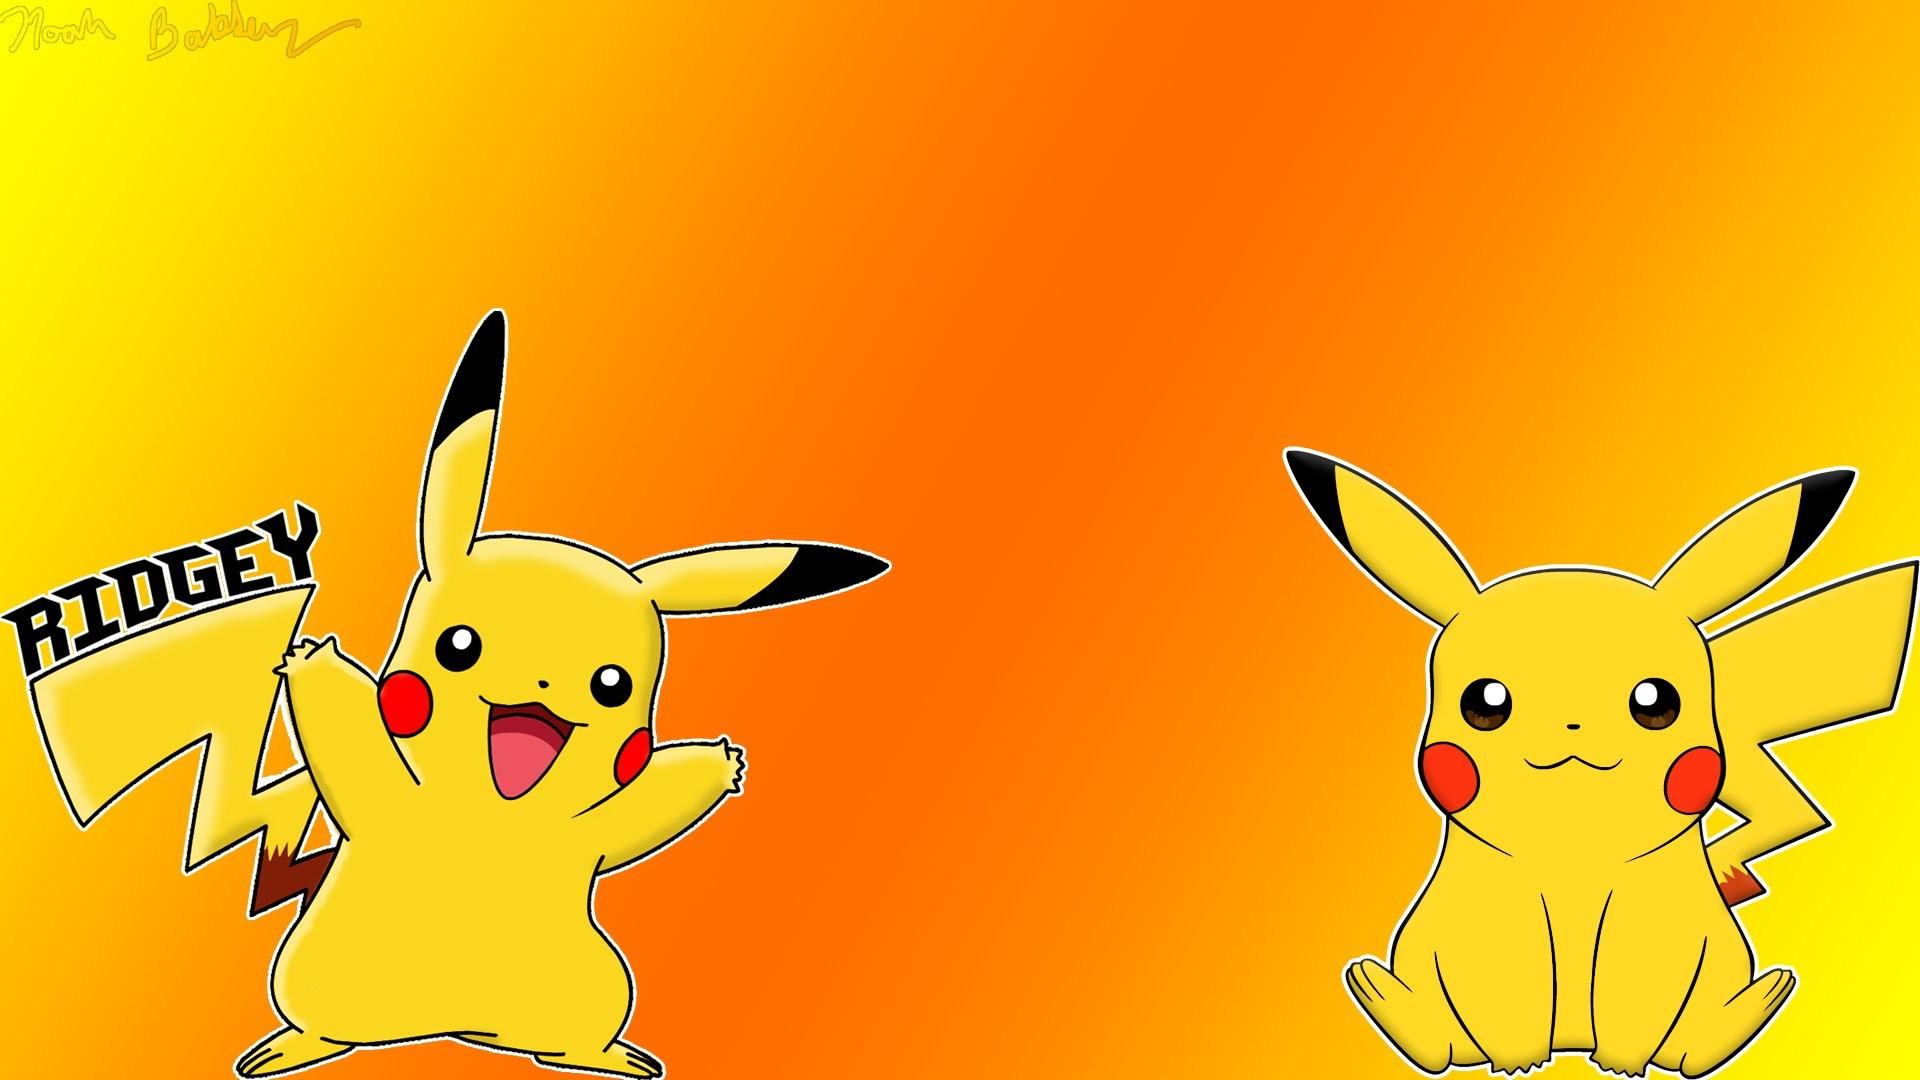 Pikachu wallpaper for Ridgey – Speedart – (download link in description) –  YouTube